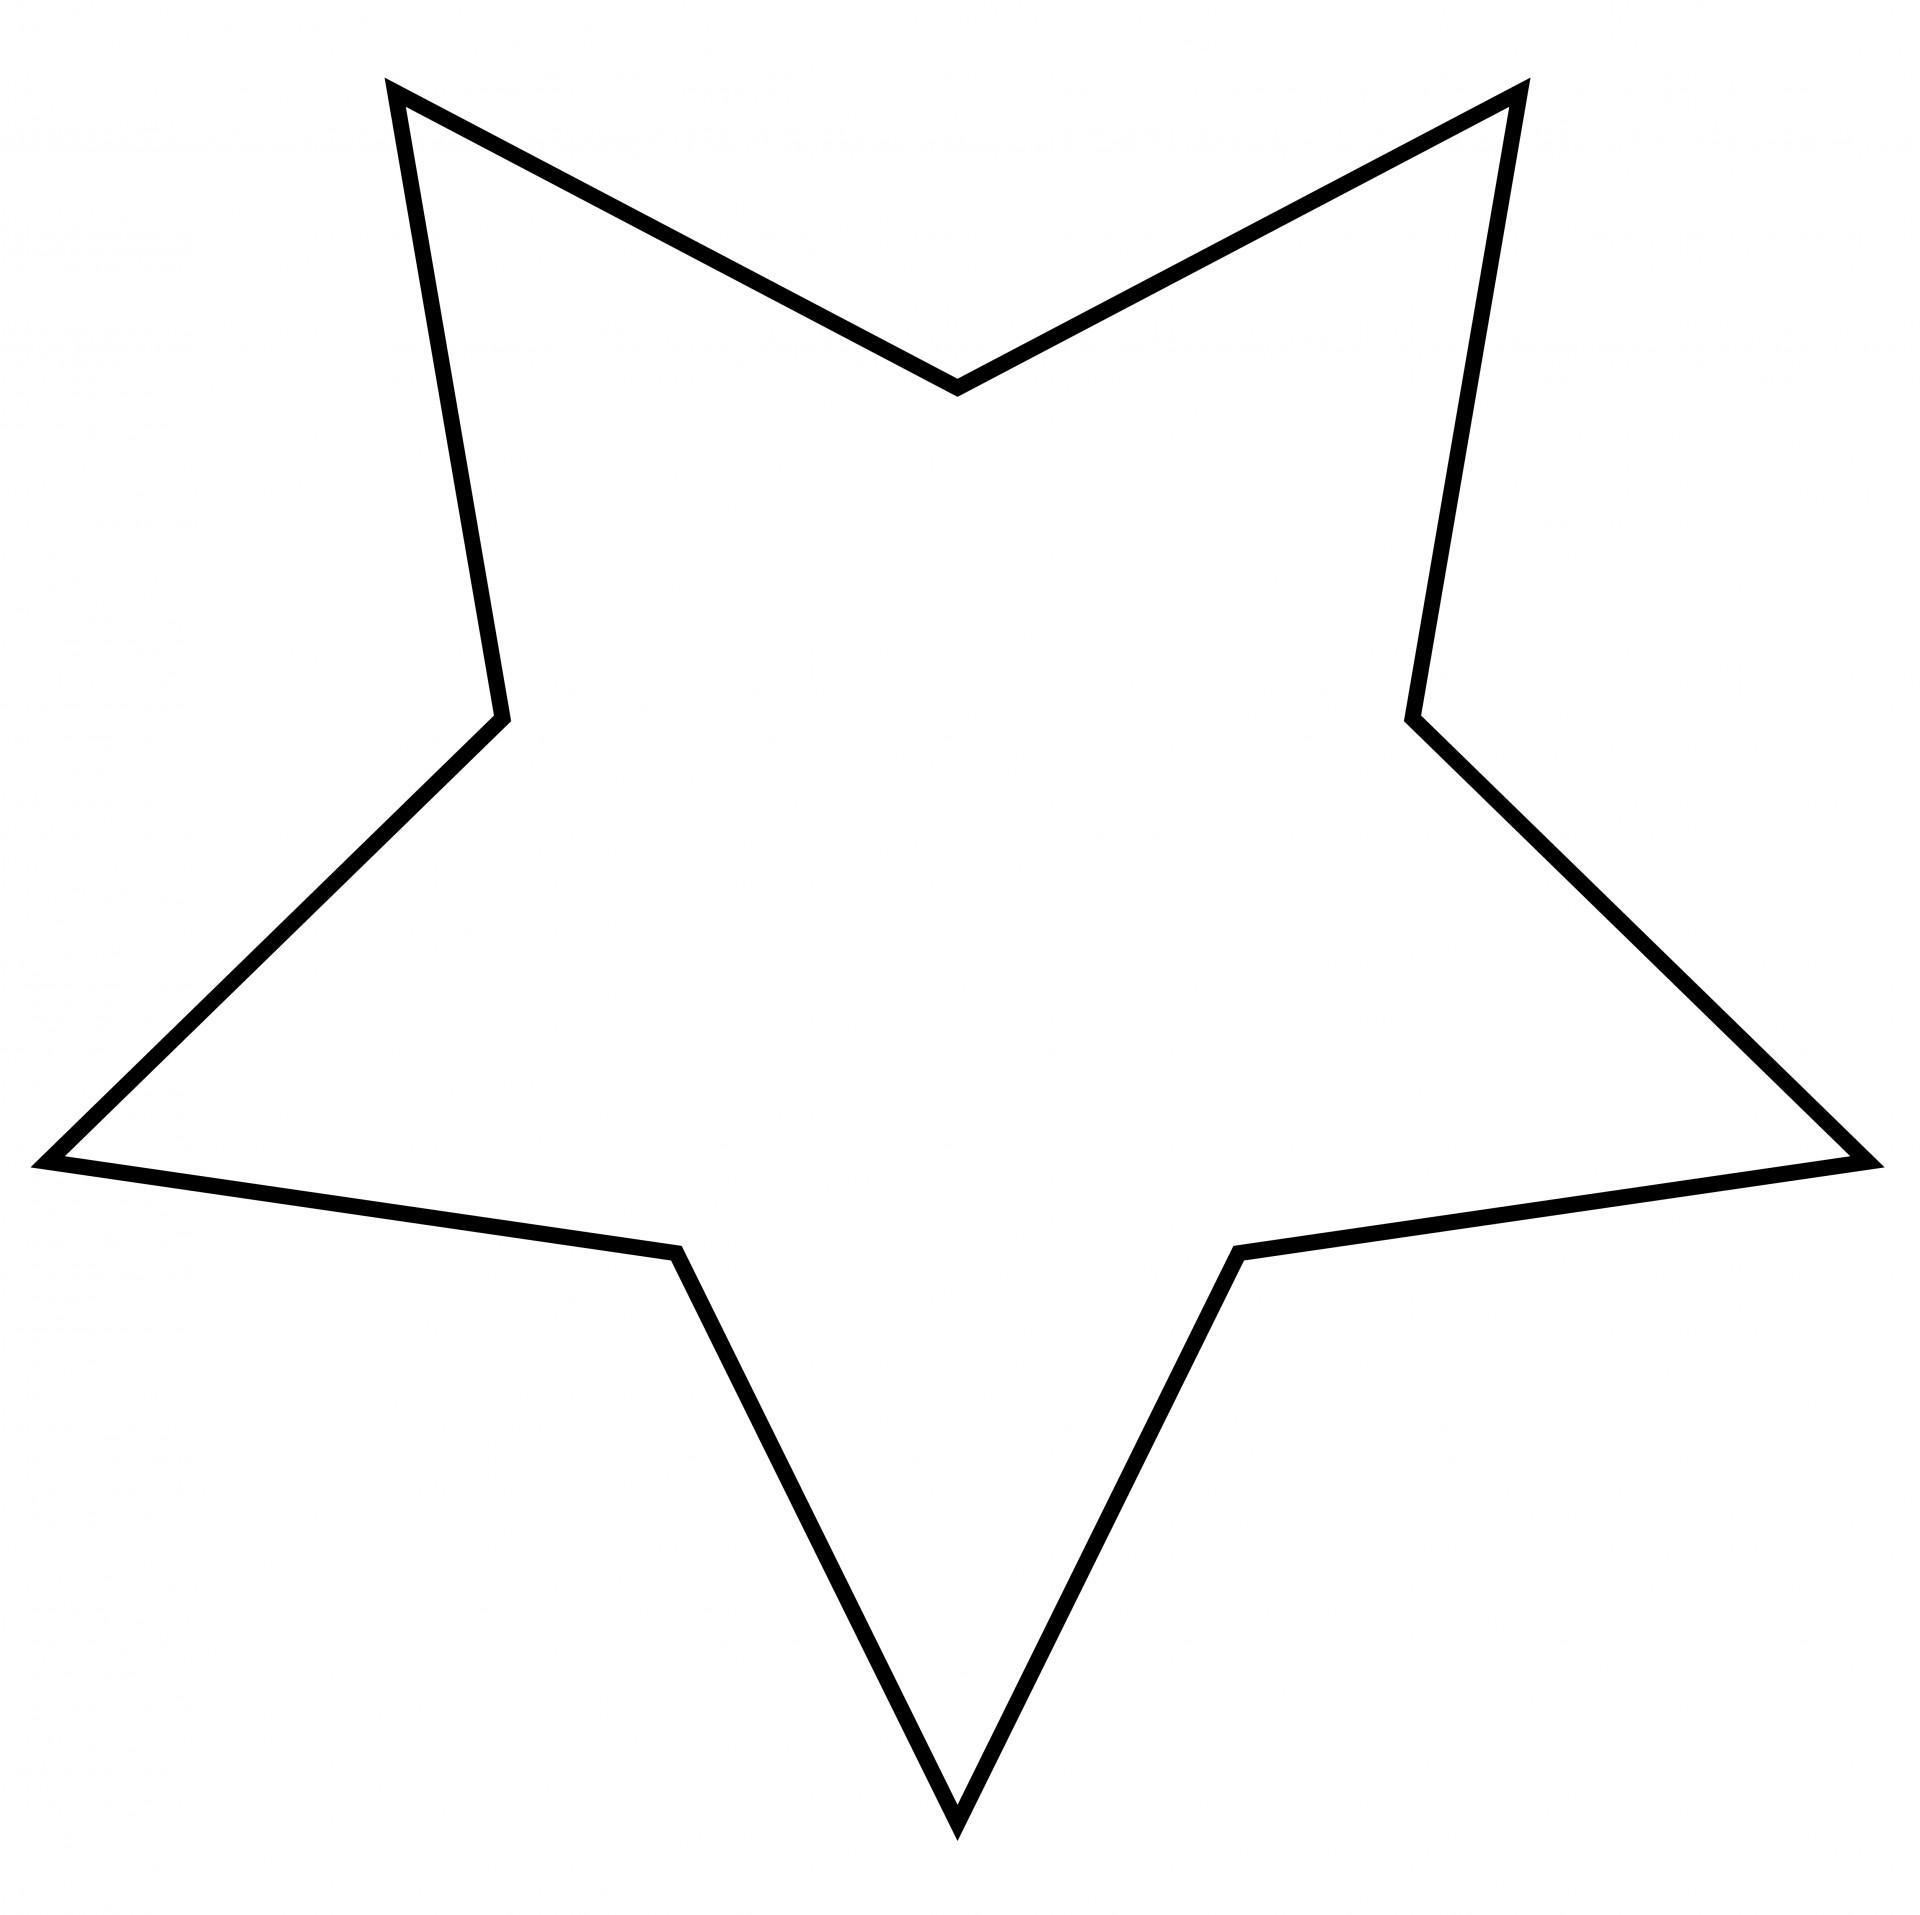 1920x1915 Star Outline